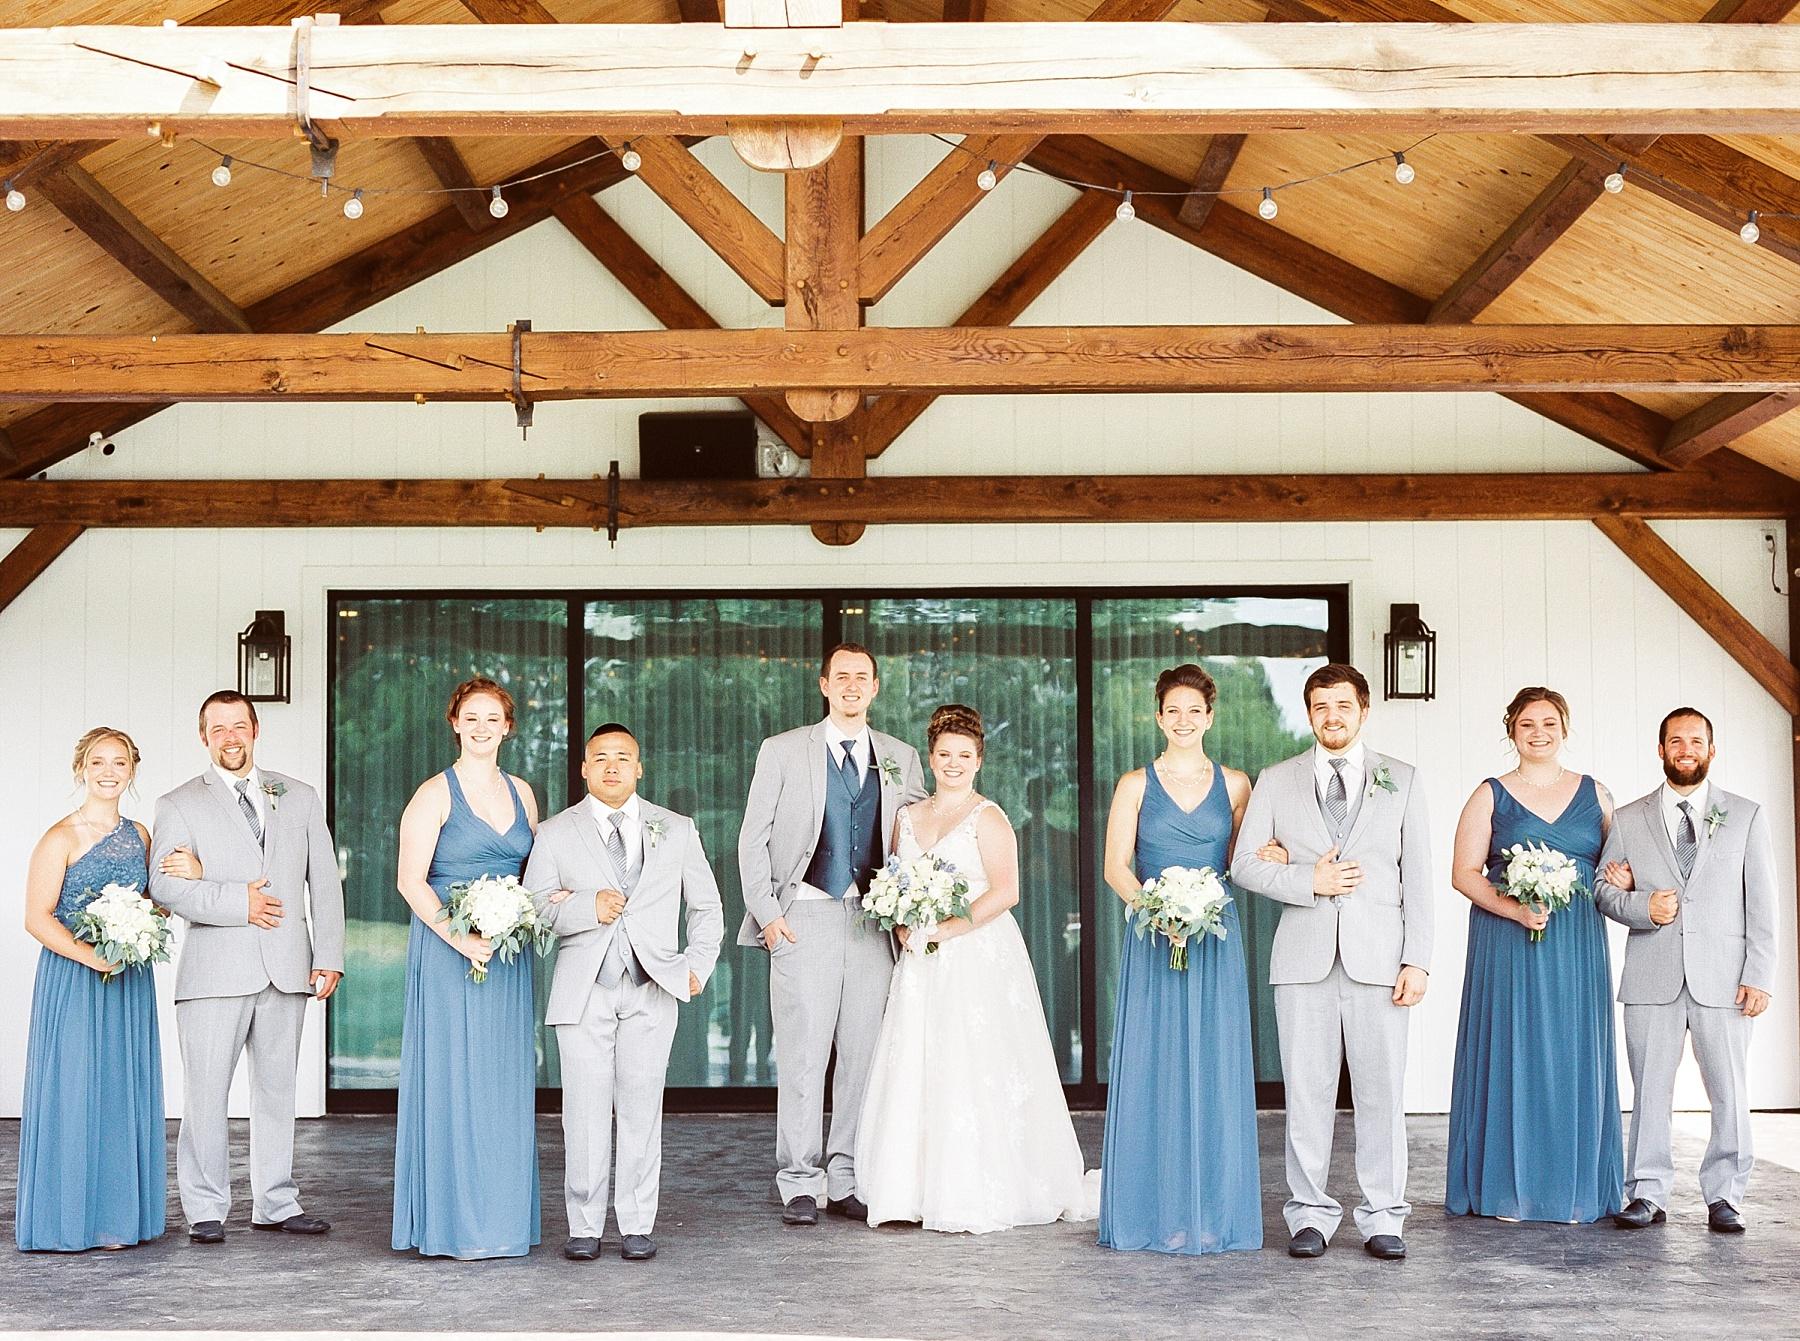 Intimate Summer Wedding at Emerson Fields by Kelsi Kliethermes Photography Best Missouri and Maui Wedding Photographer_0019.jpg